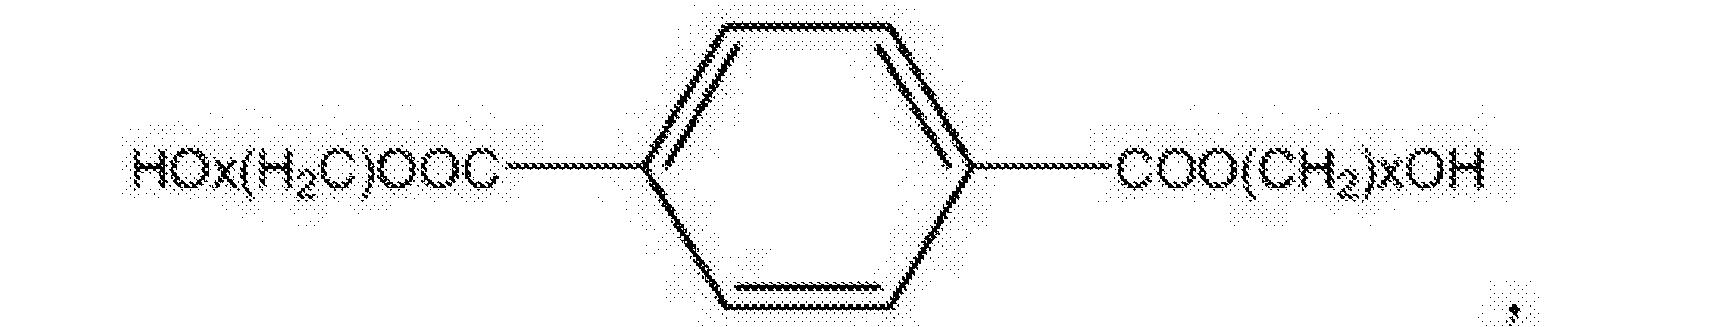 Figure CN106893640AD00041